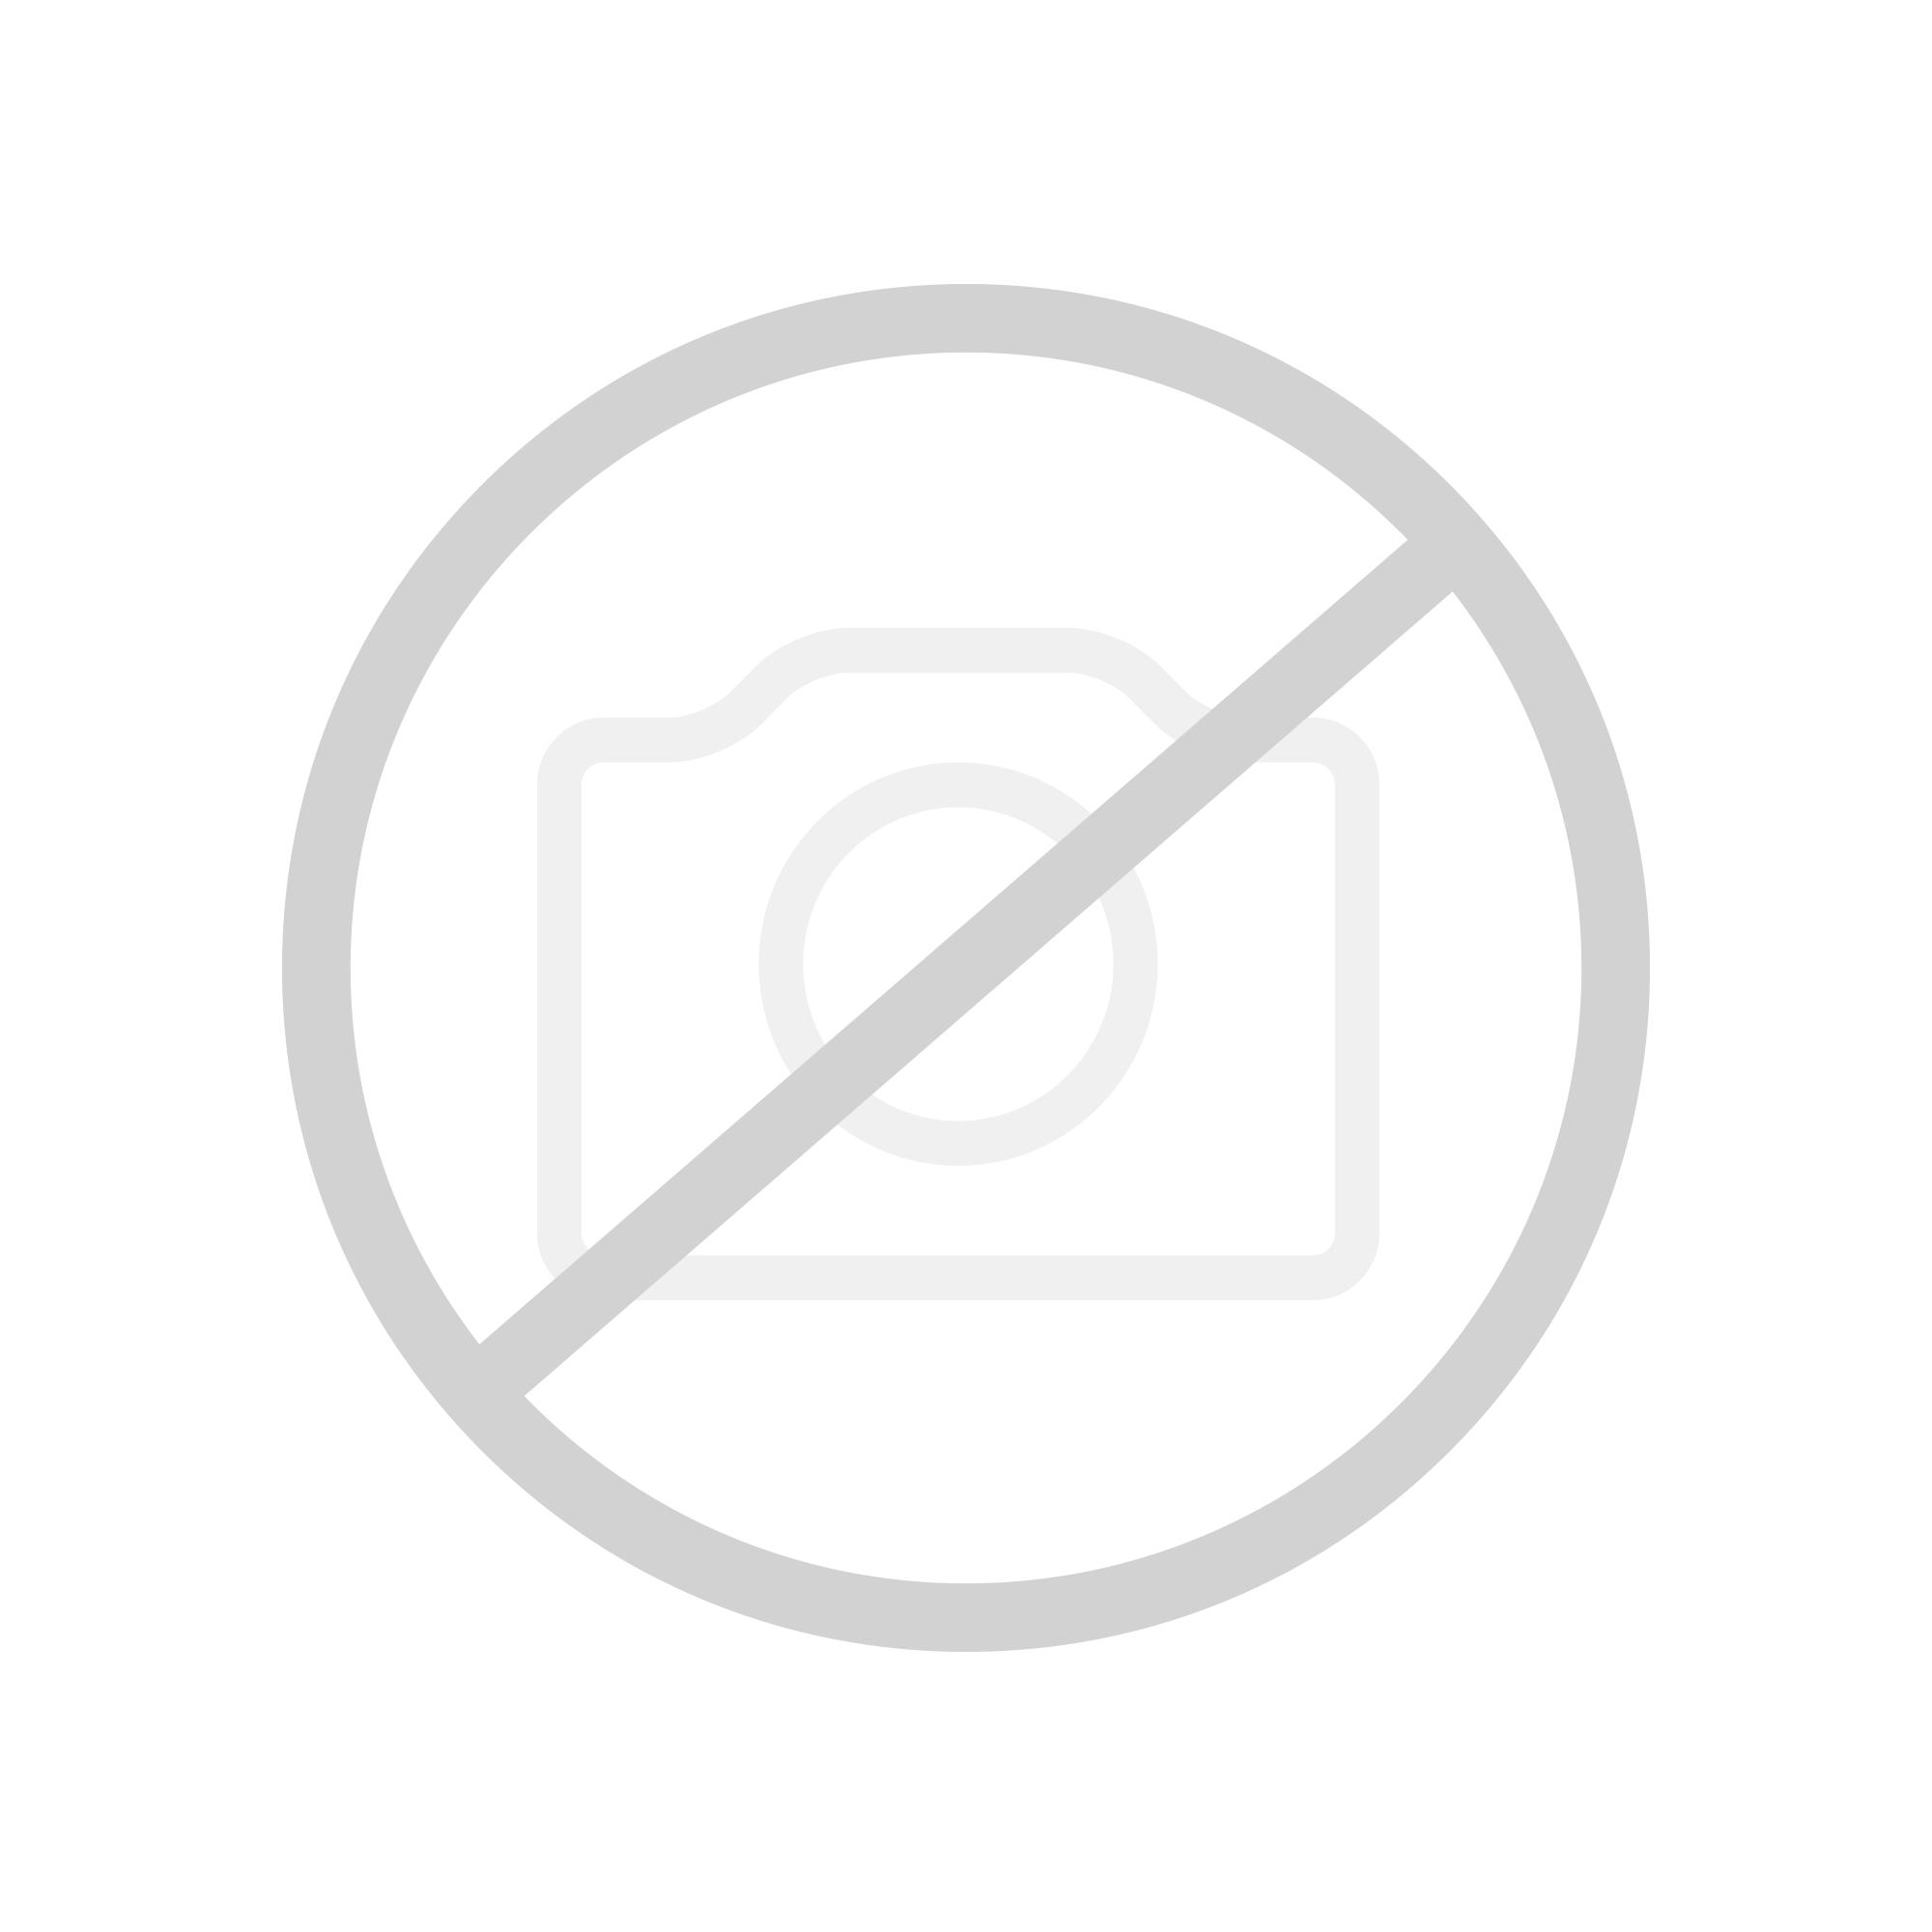 HSK Duschpaneel Lavida gekürzt B: 210 H: 1600 T: 670 mm freihängende Regentraverse edelstahl poliert